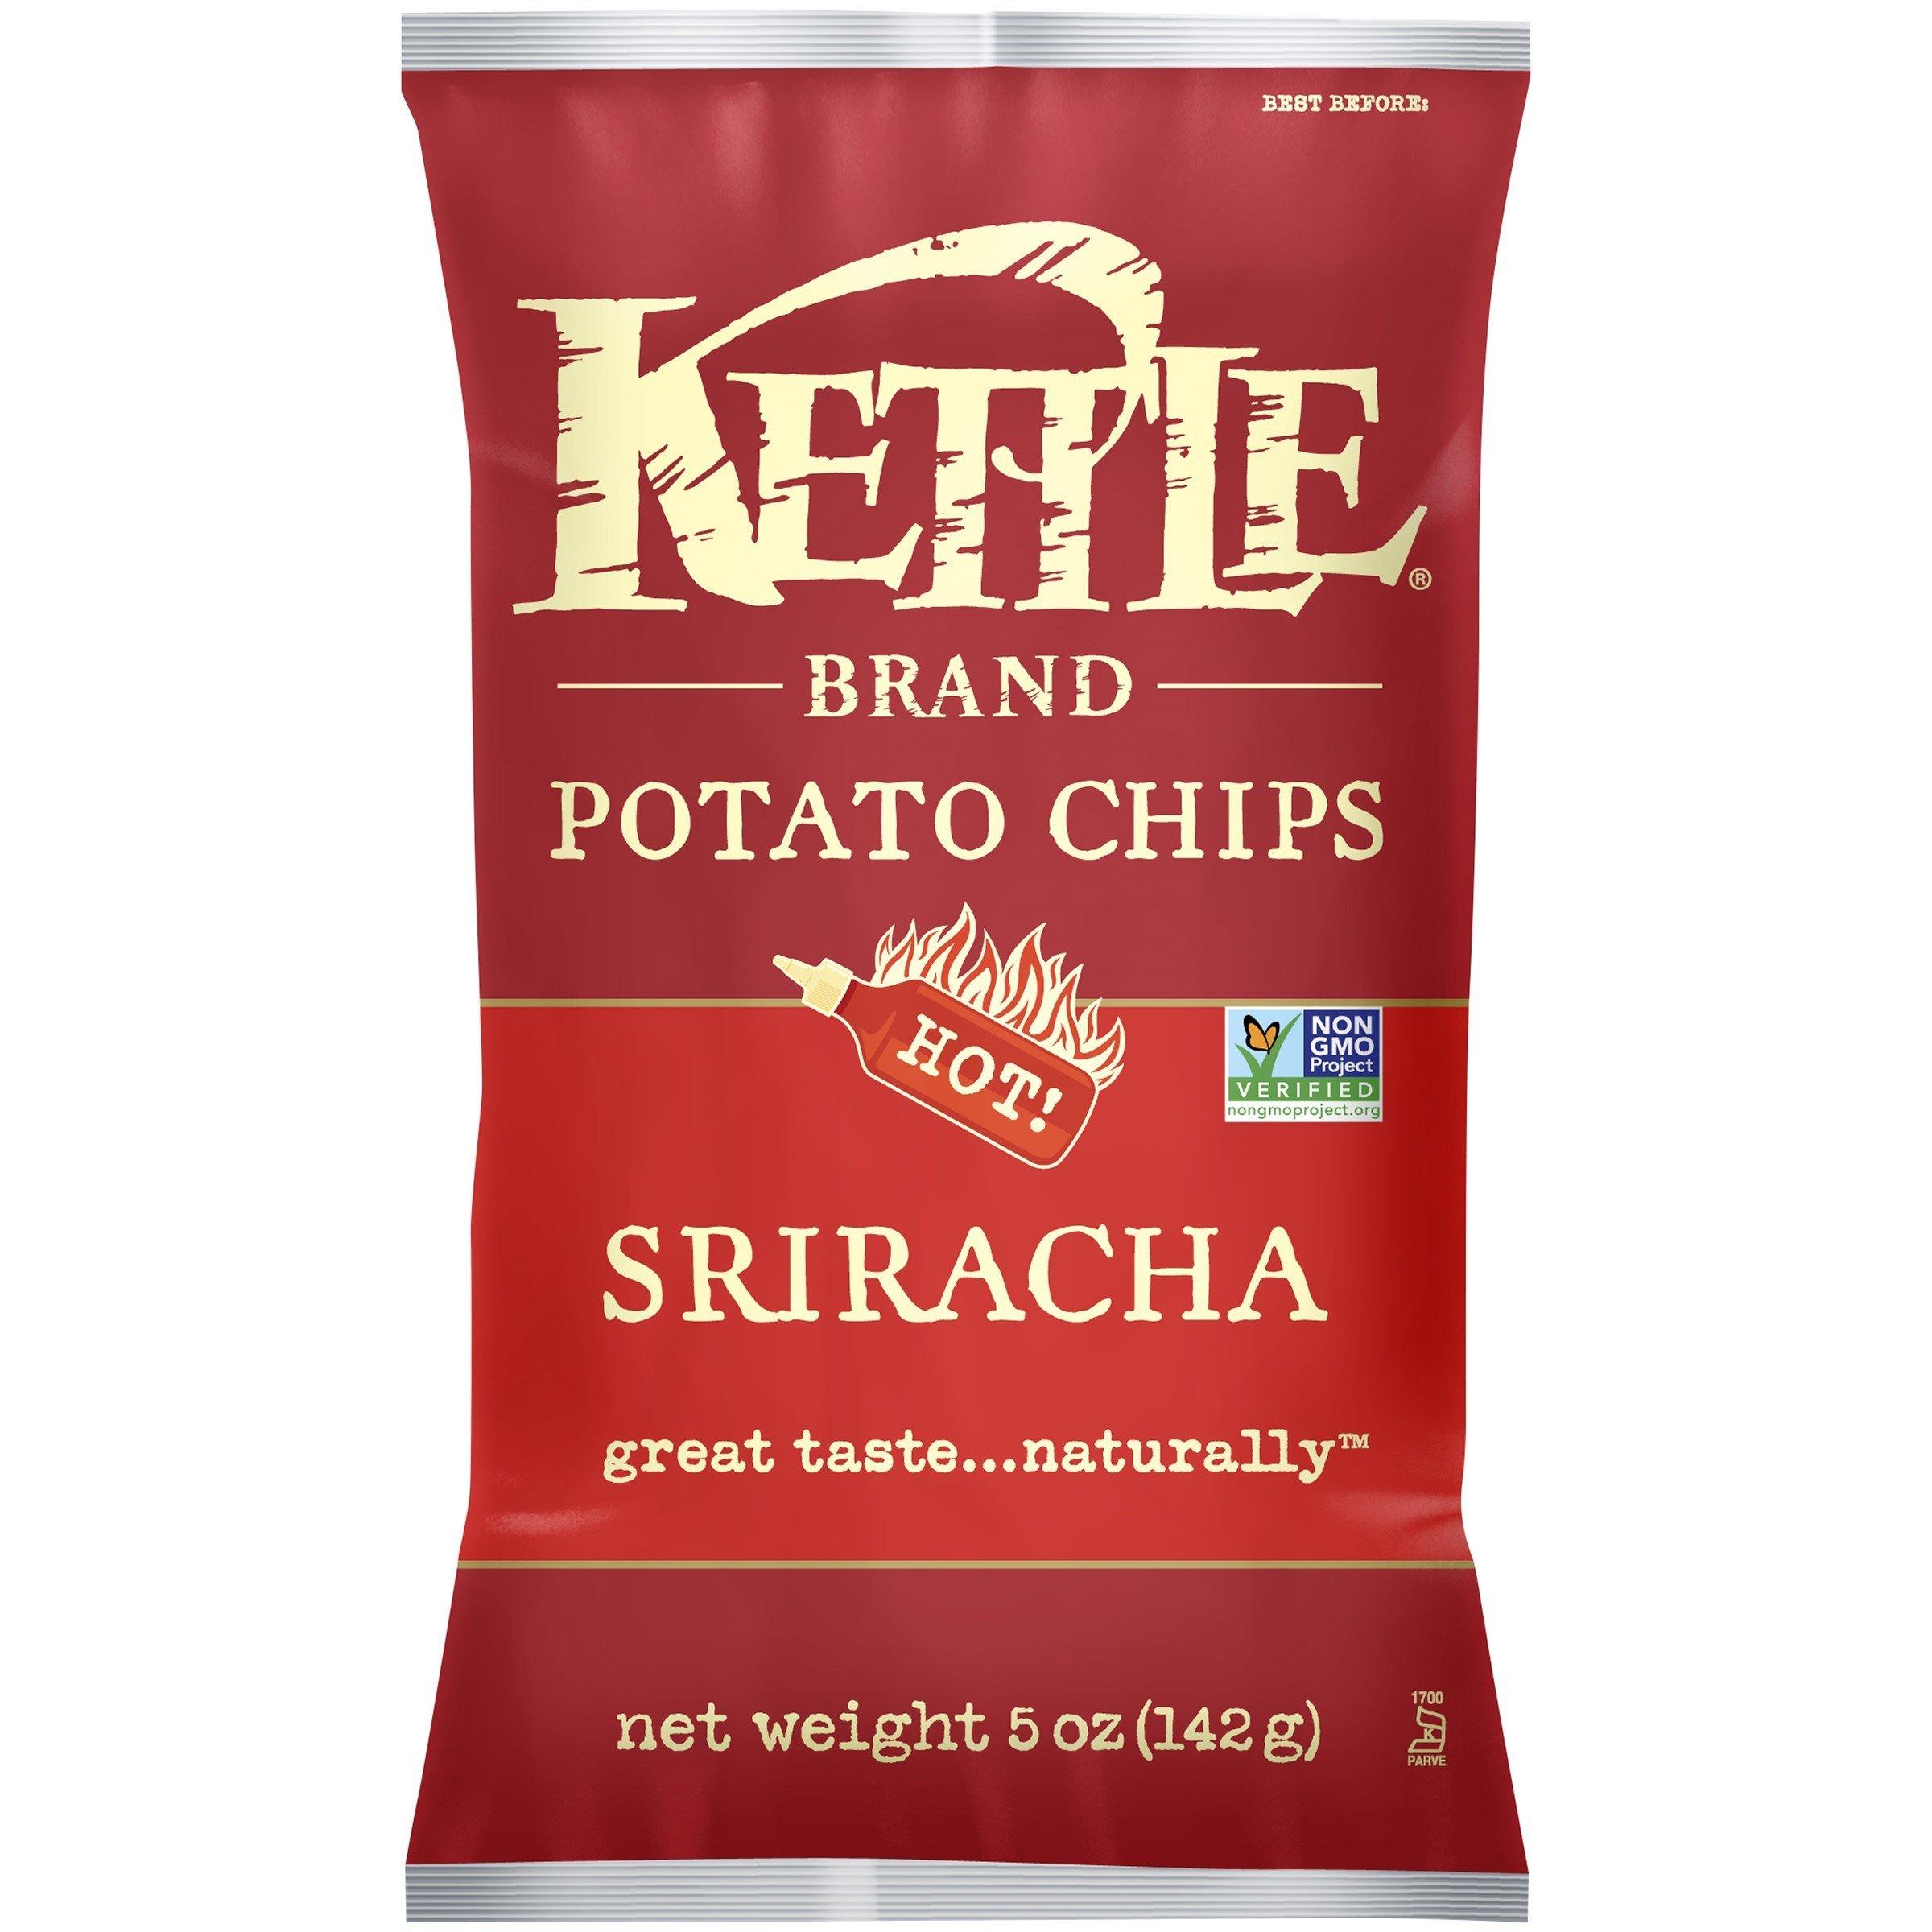 Kettle Chips - Sriracha 1301